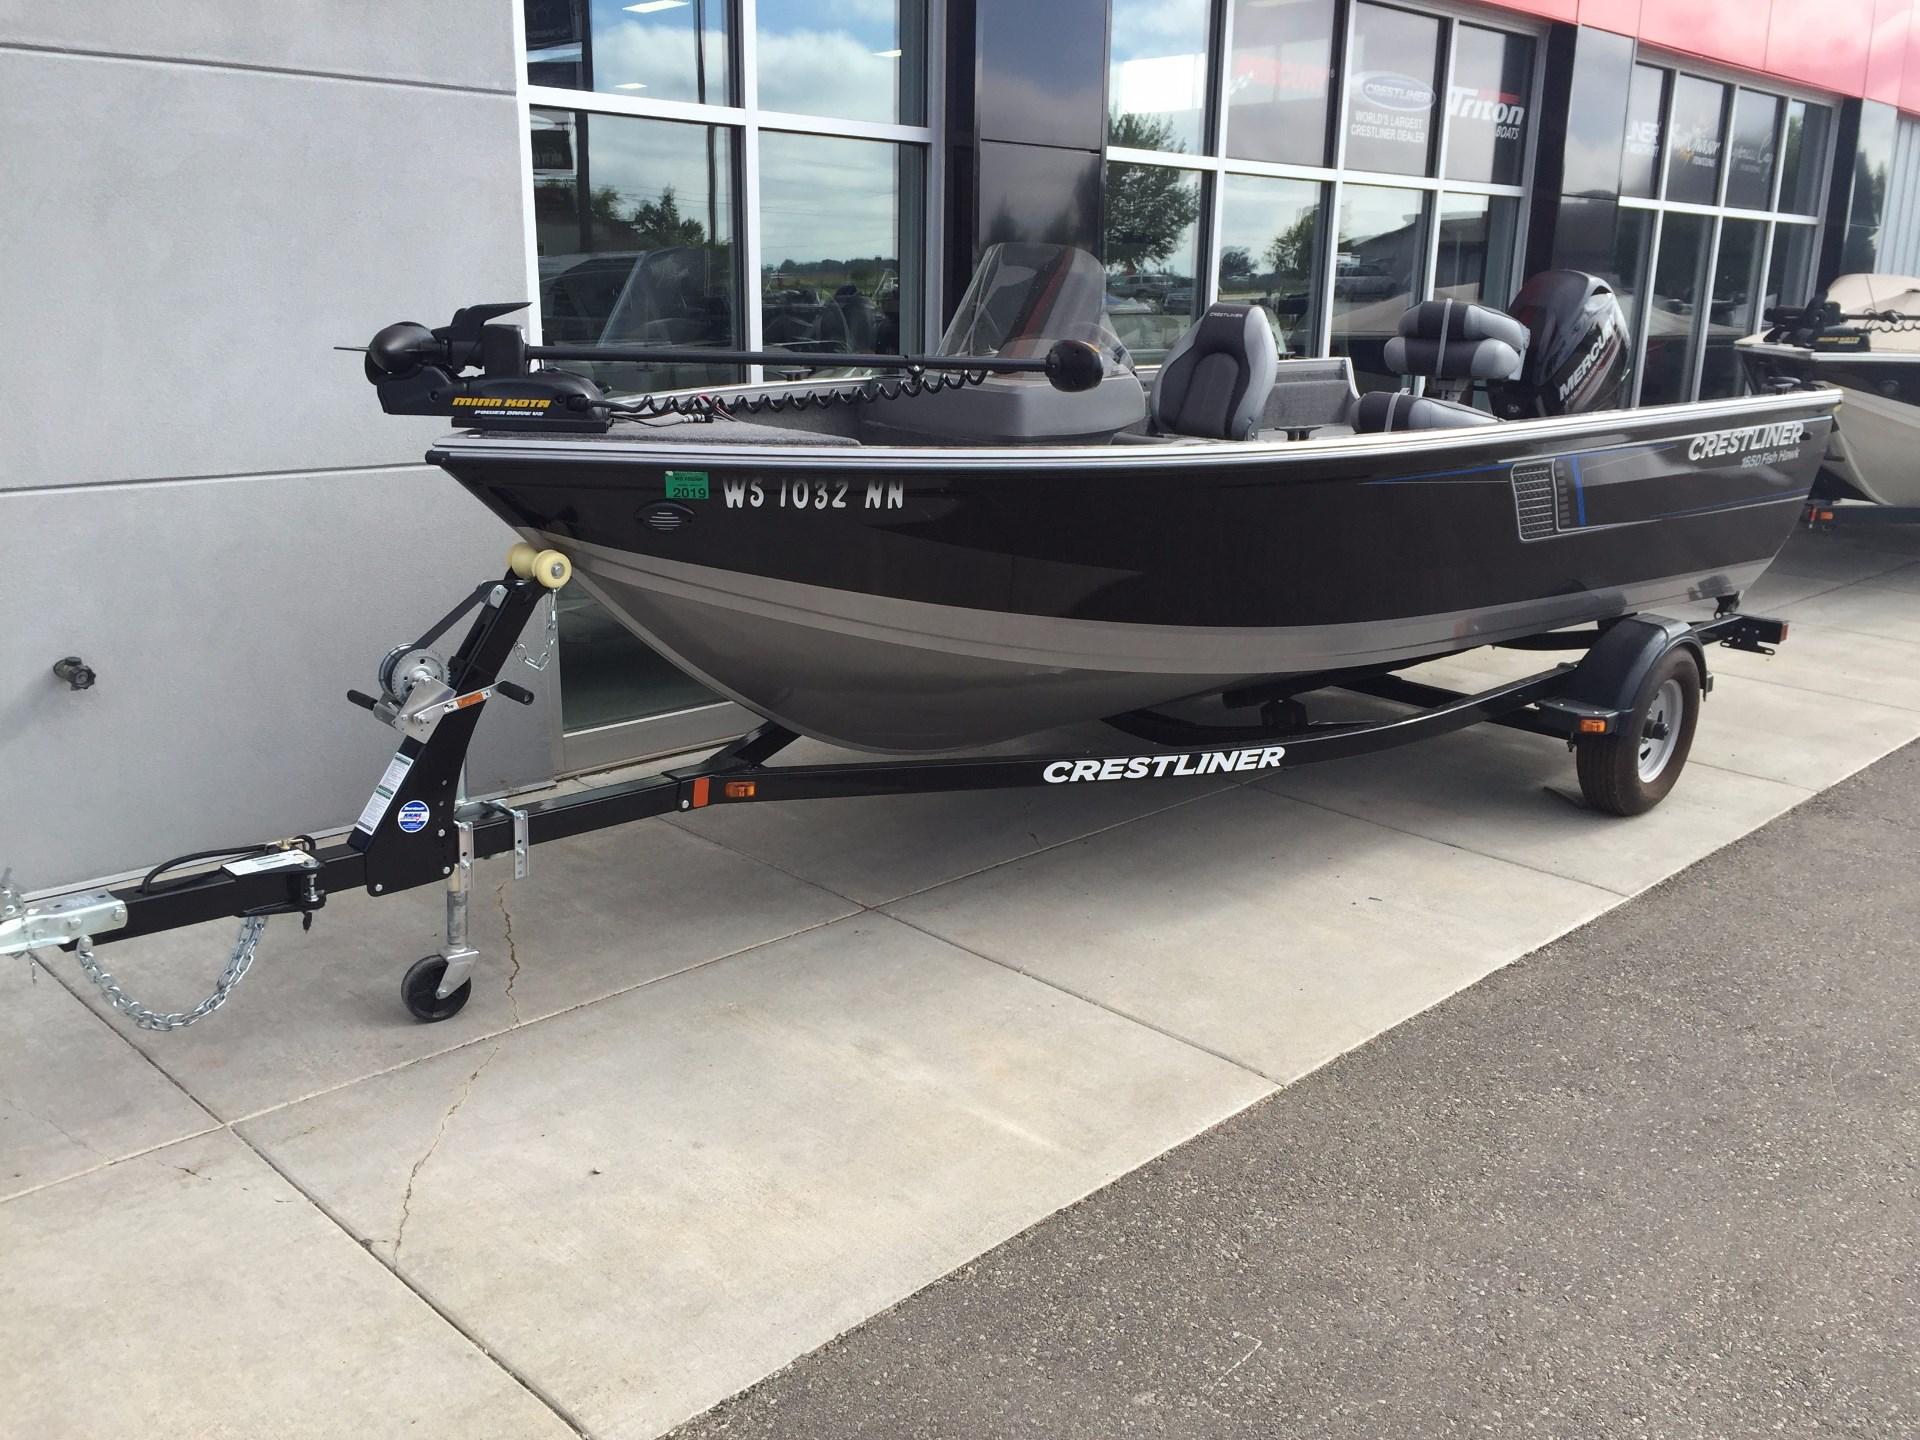 Used crestliner fish hawk 1650 boats for sale for Crestliner fish hawk